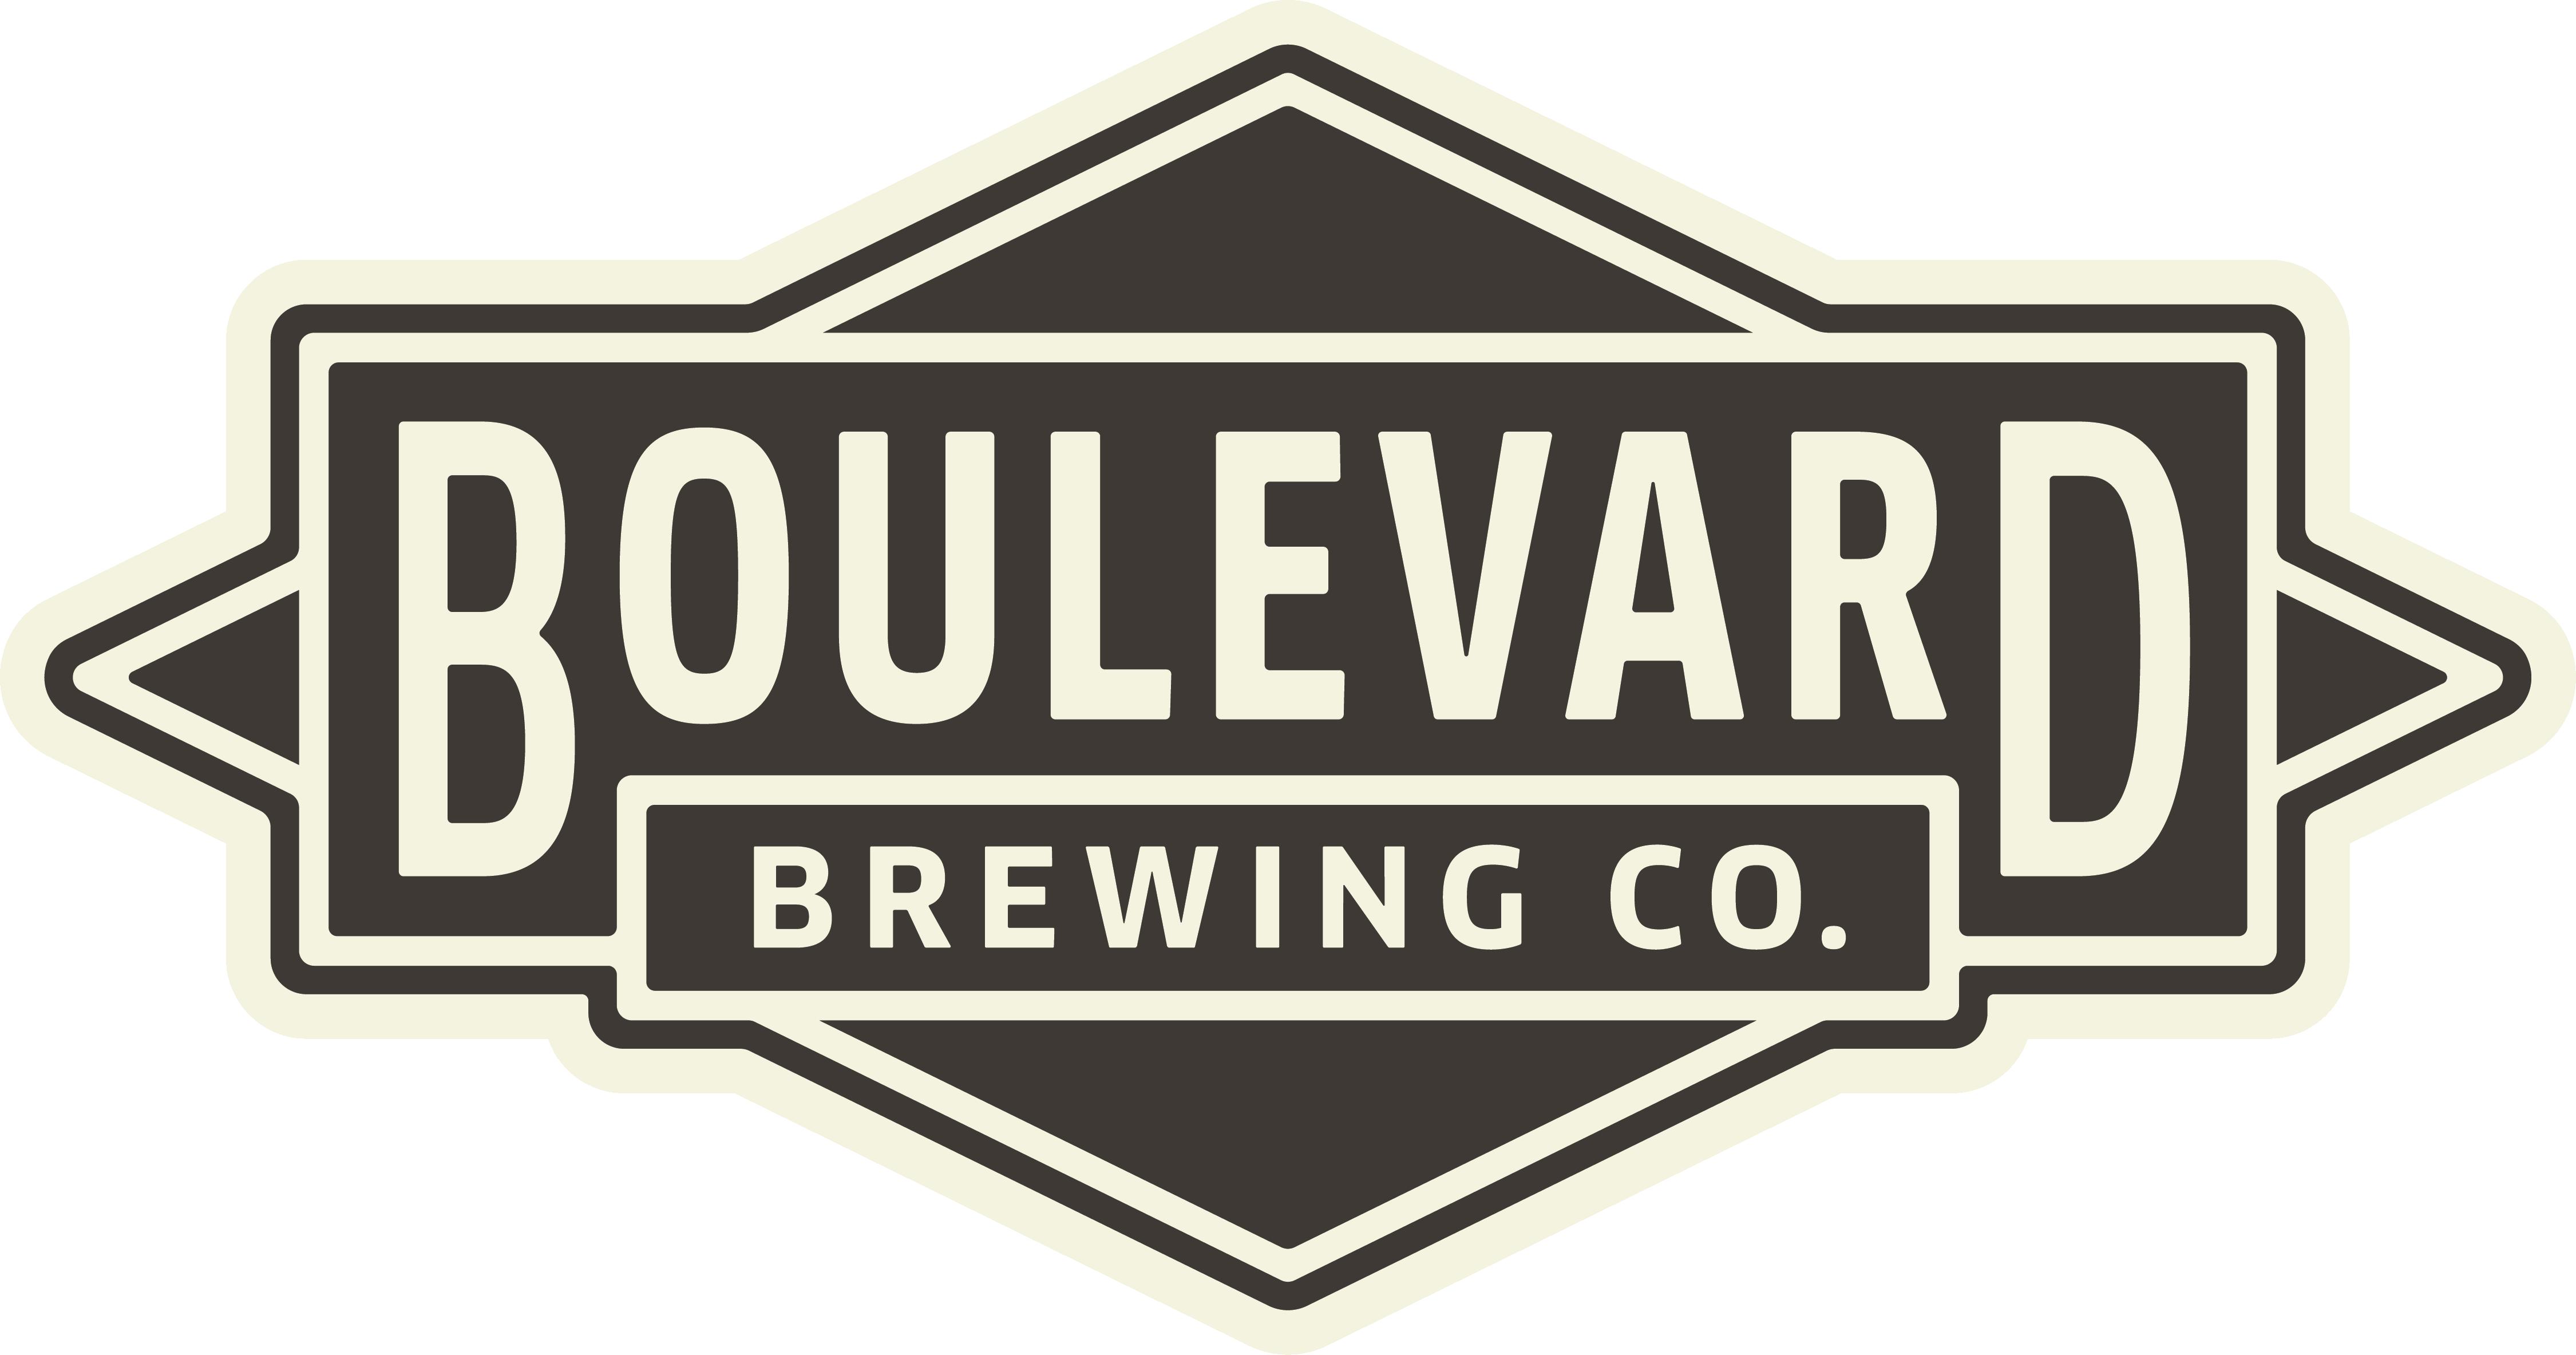 Logotyp för Boulevard bryggeri